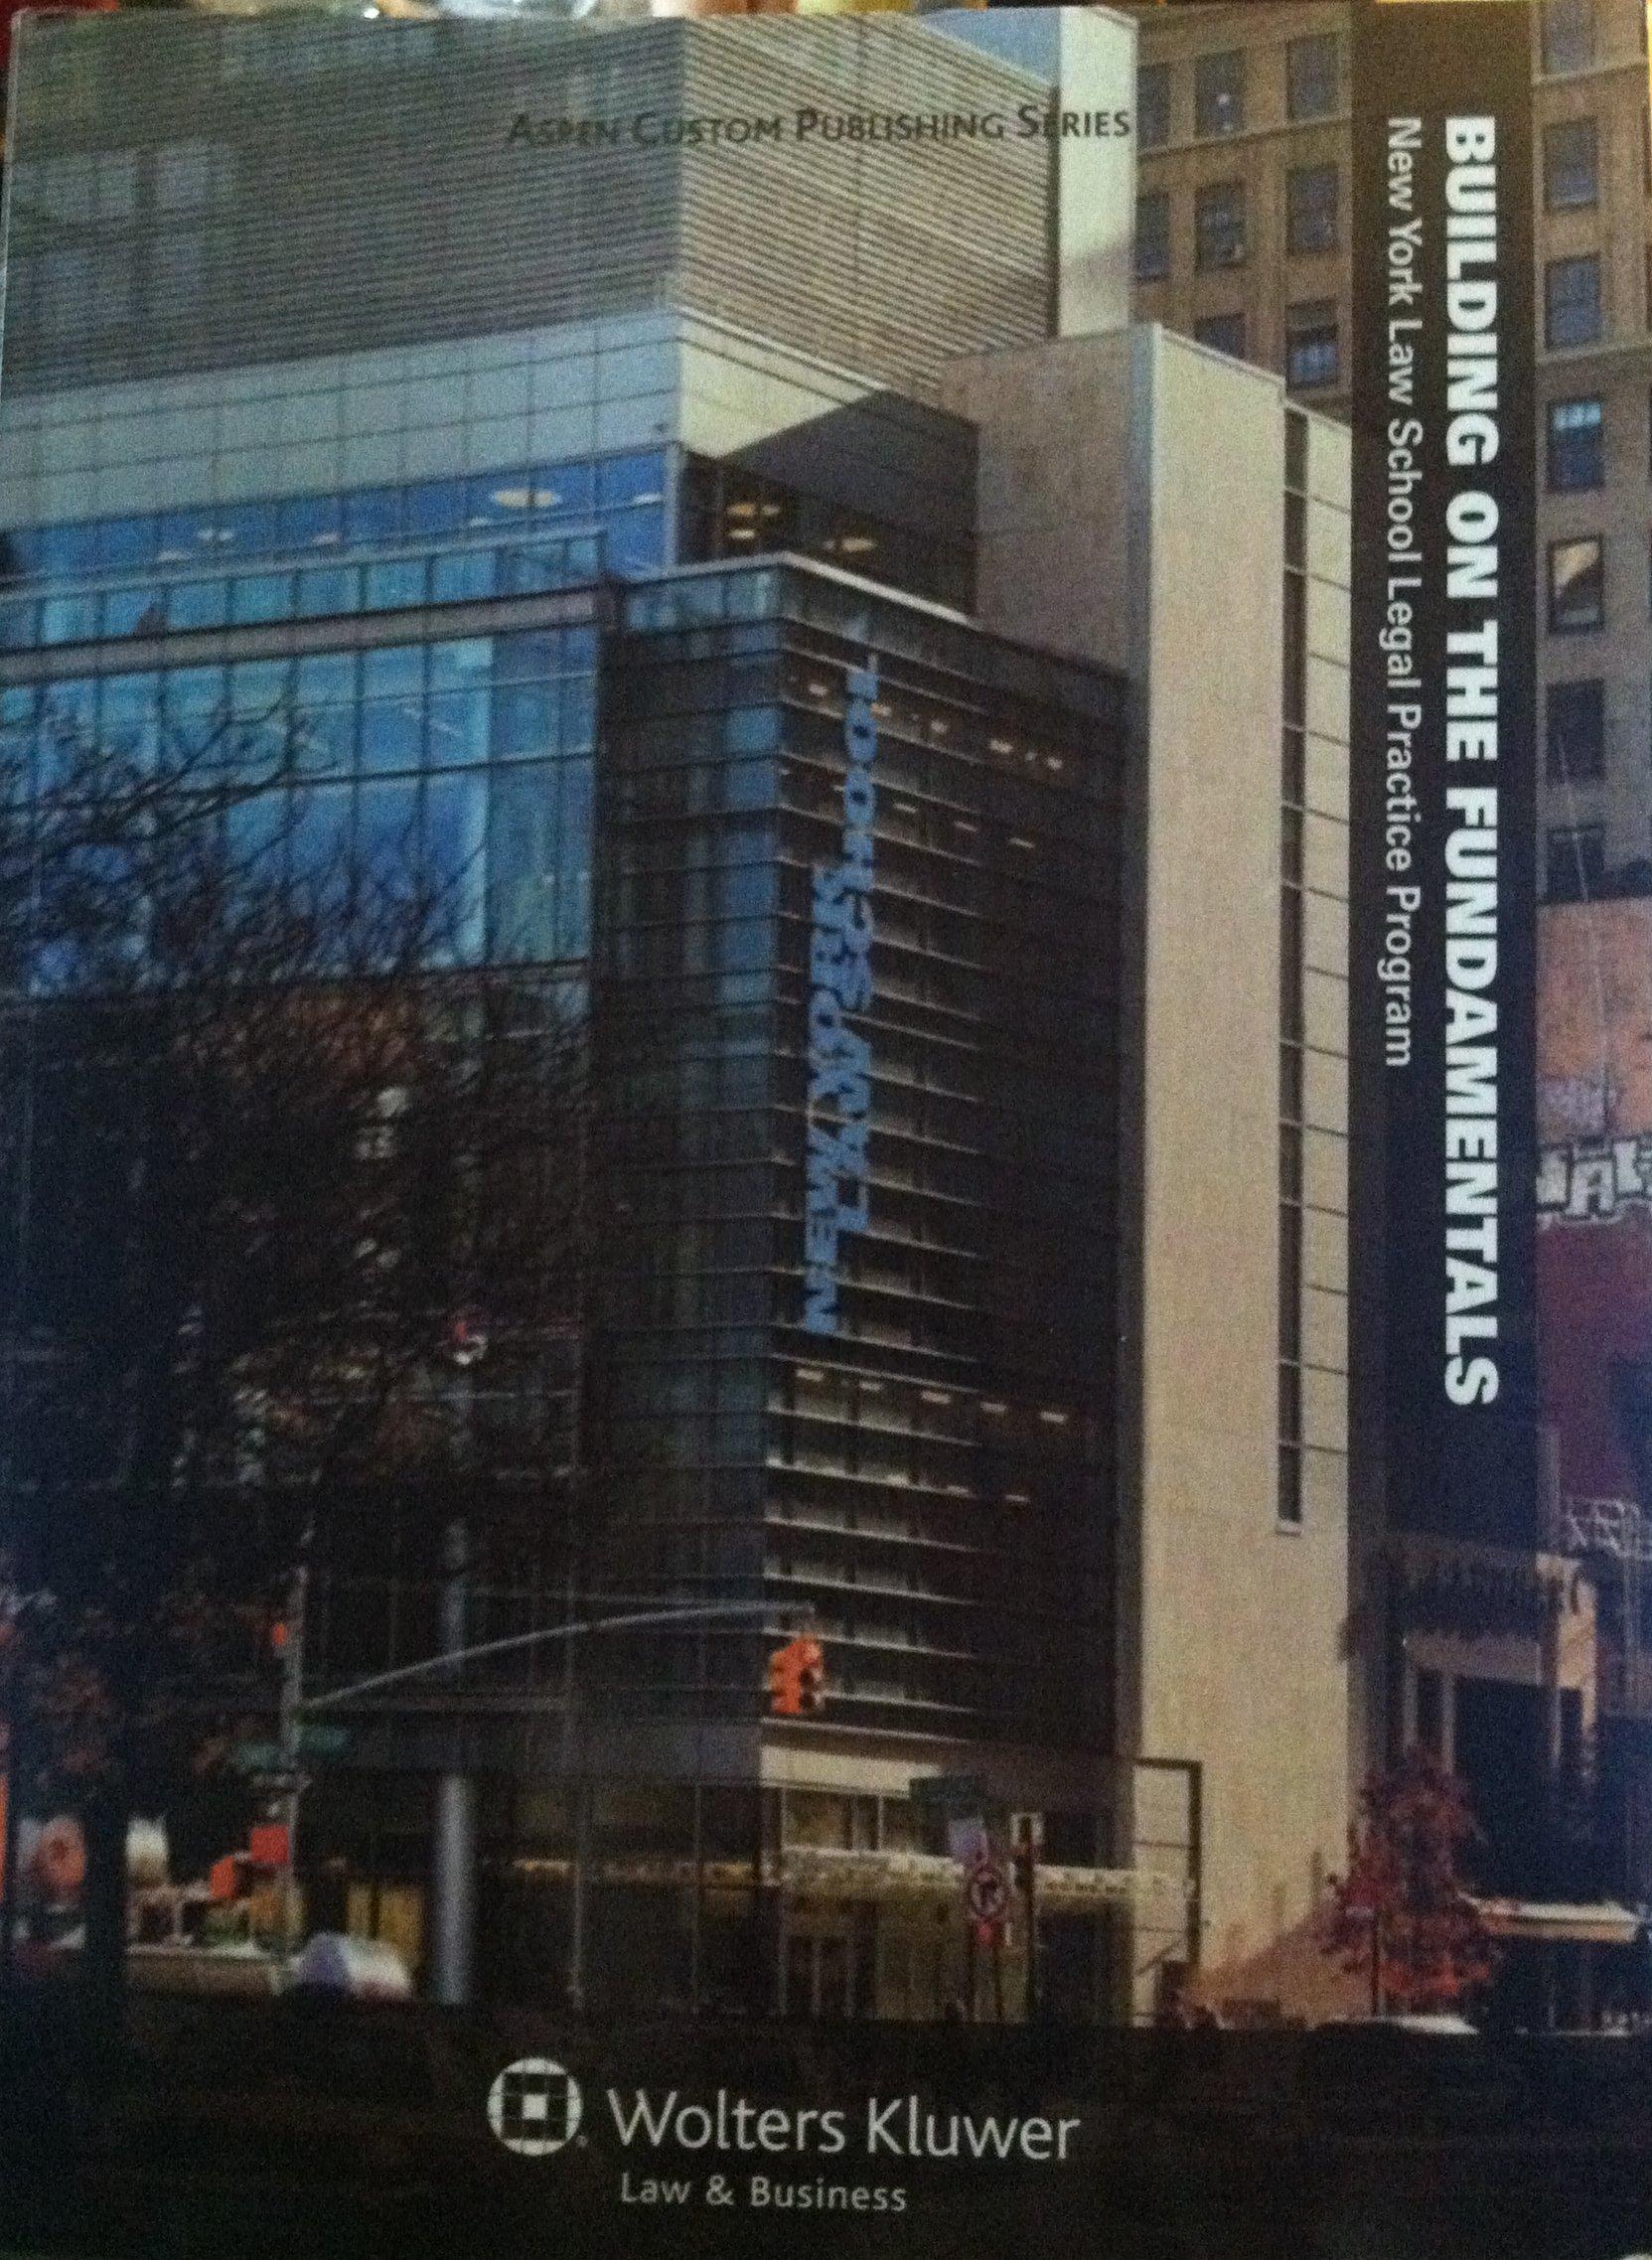 Download Building on the Fundamentals, New York Law School Legal Practice Program (Aspen Custom Publishing Series) PDF